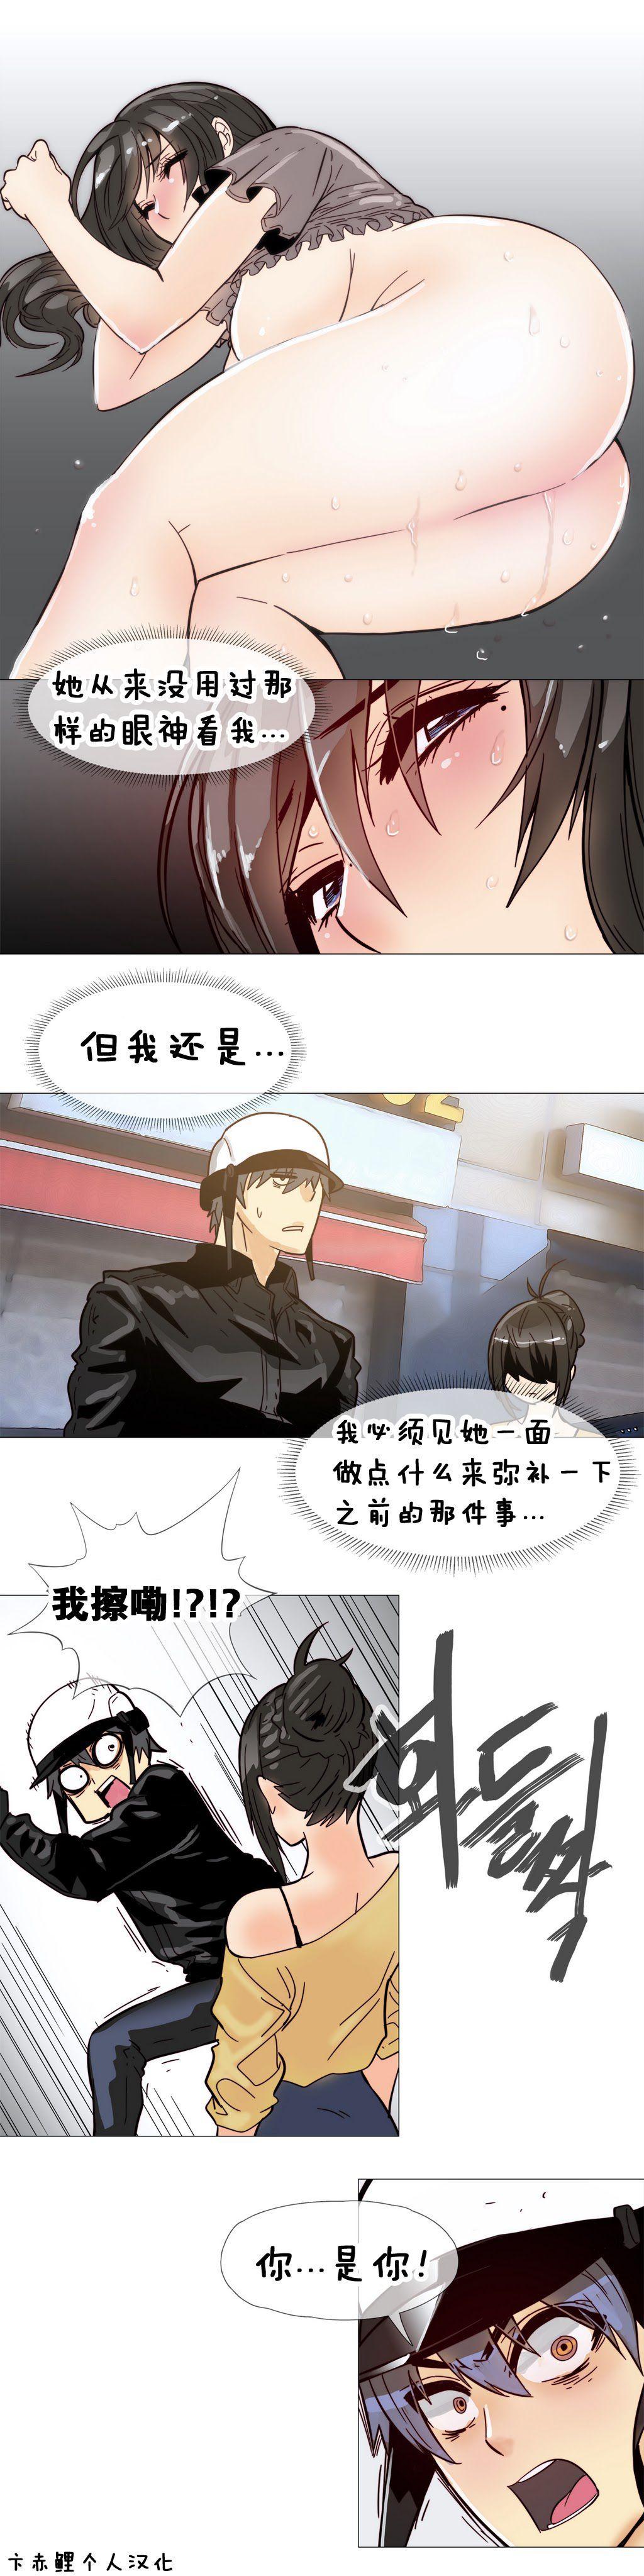 HouseHold Affairs 【卞赤鲤个人汉化】1~33话(持续更新中) 238